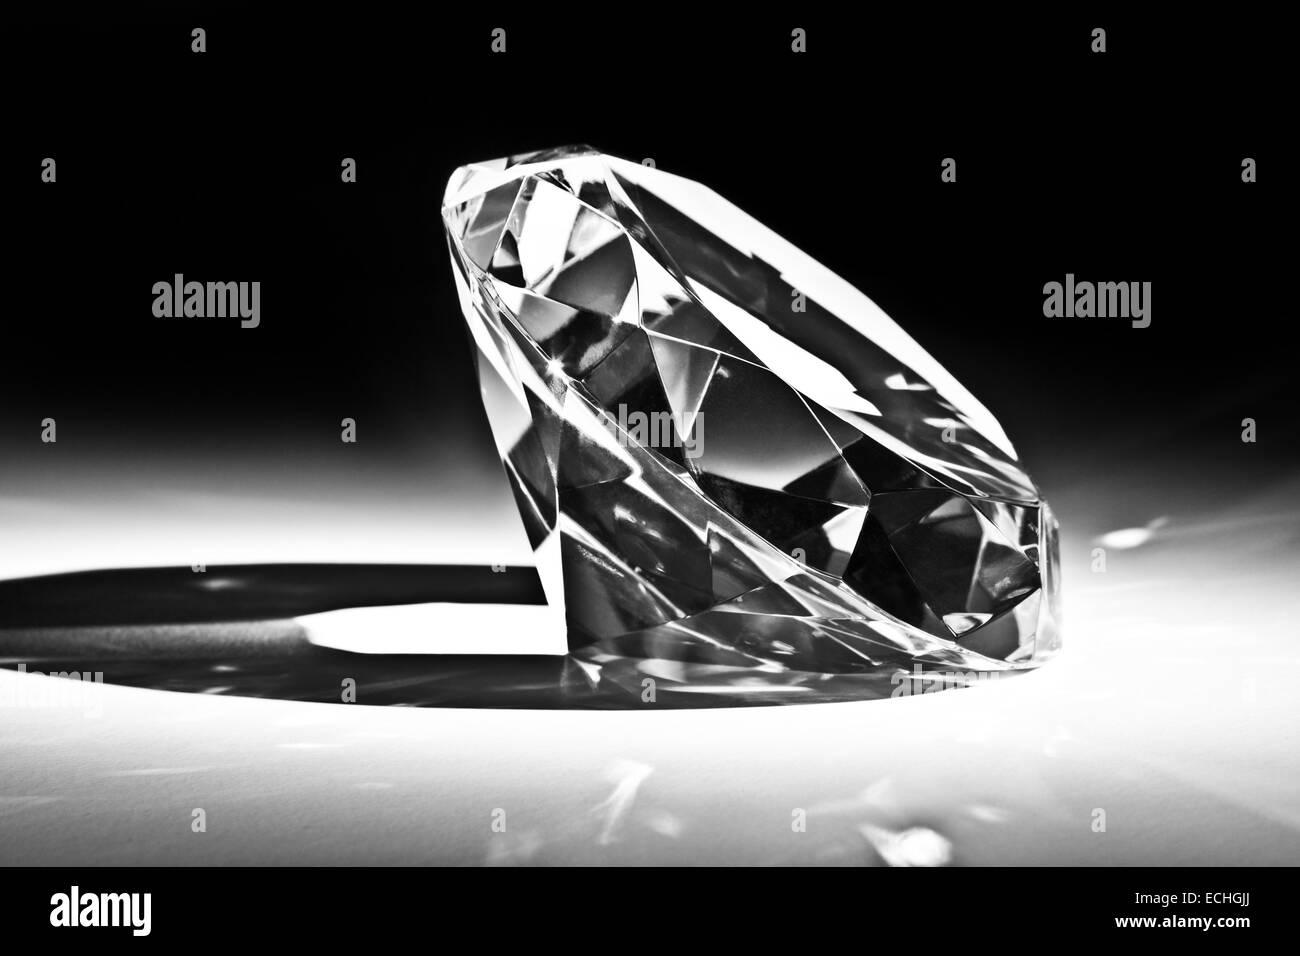 classic diamond close up image - Stock Image